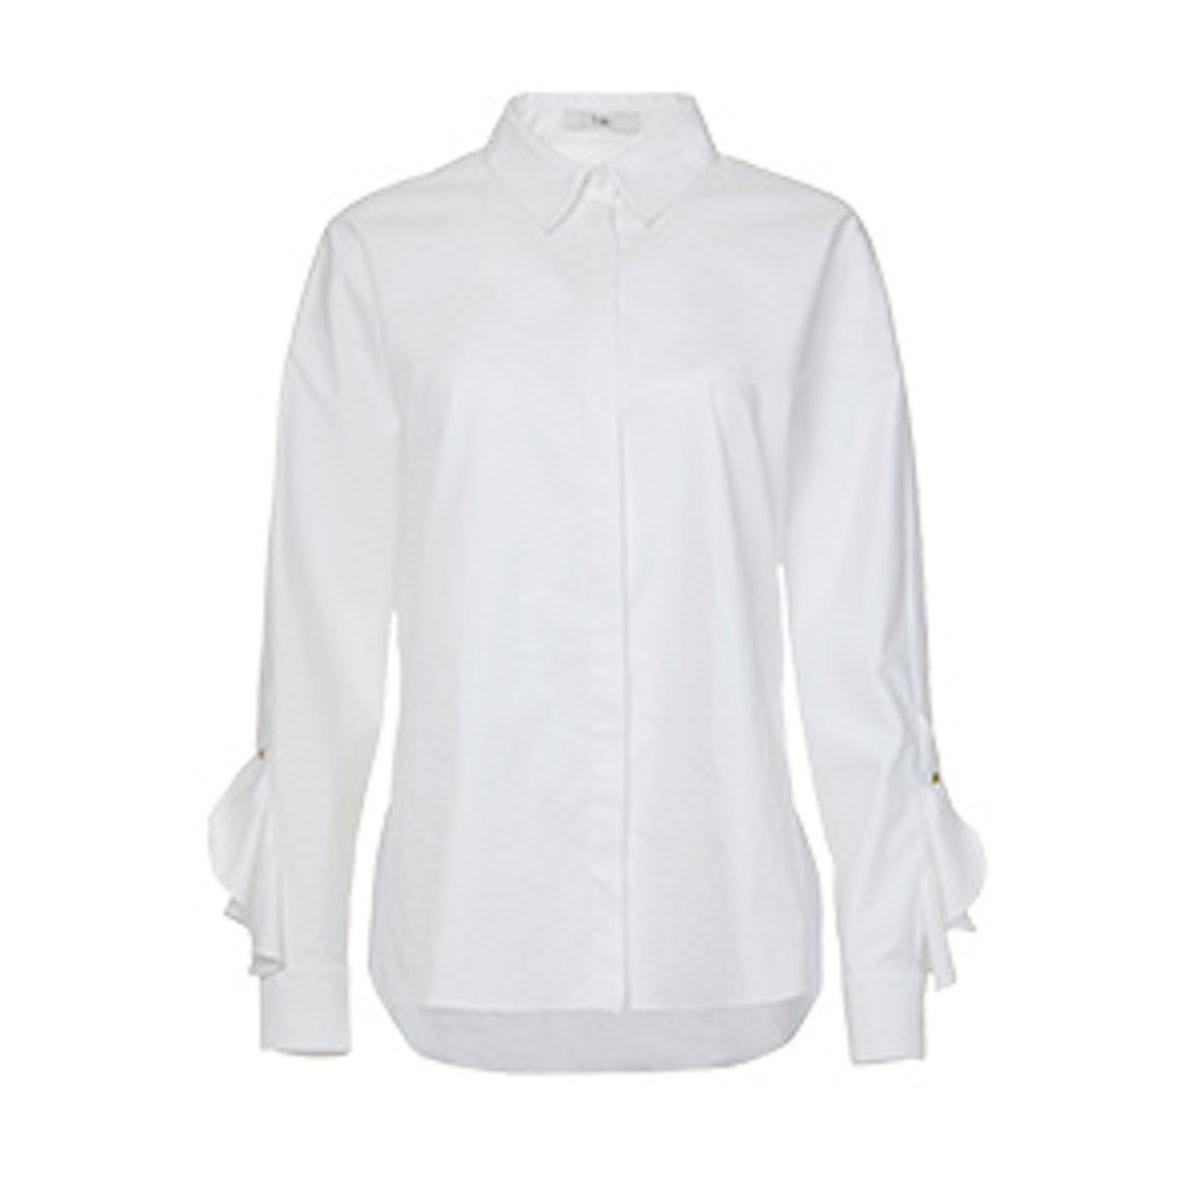 Satin Poplin Dolman Sleeve Ruffle Shirt